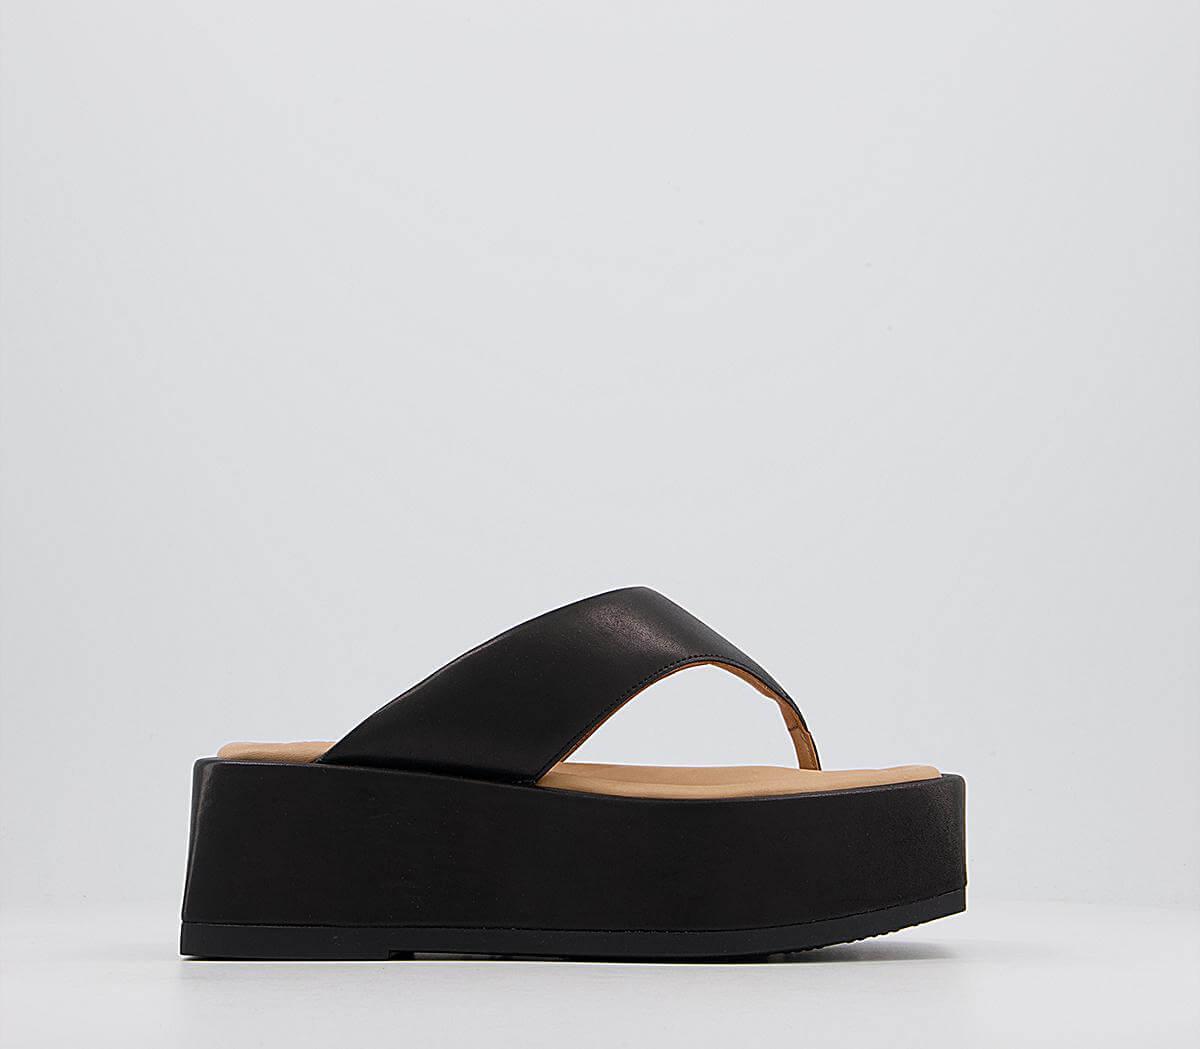 Al Fresco Fashion: Viva has you covered - Atelier by Vagabond Juno Toe Thong Platform Sandals £145.